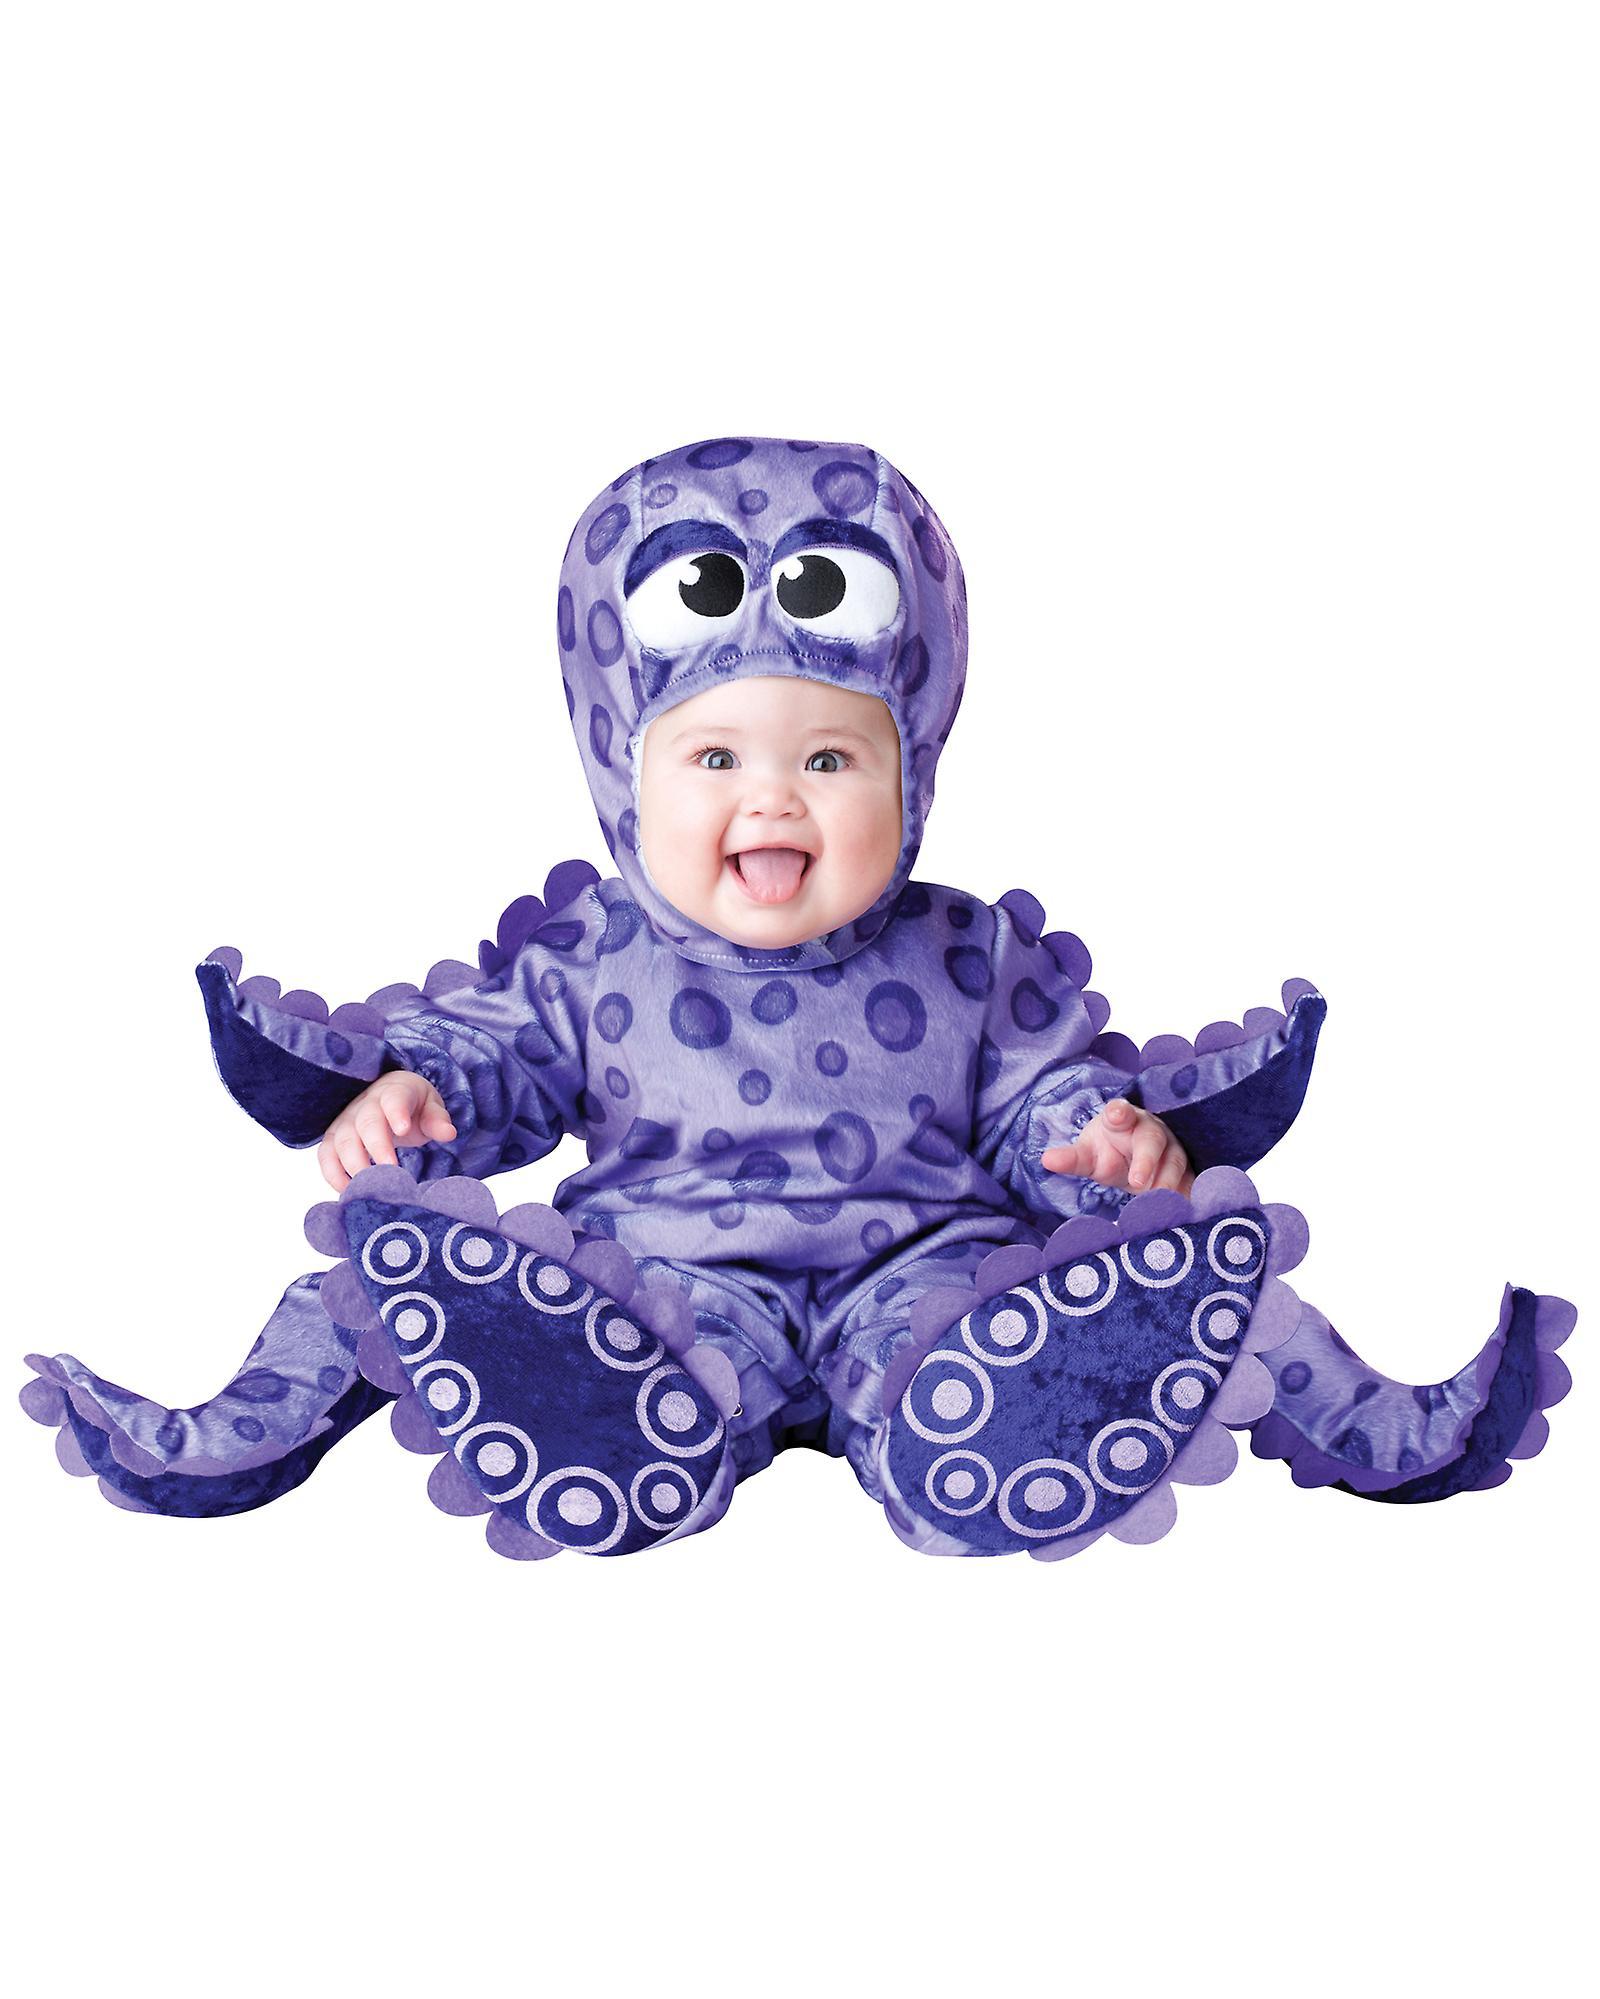 ec94fc108275 Lille fangarme blæksprutte Sealife Deluxe Baby drenge piger spædbarn kostume